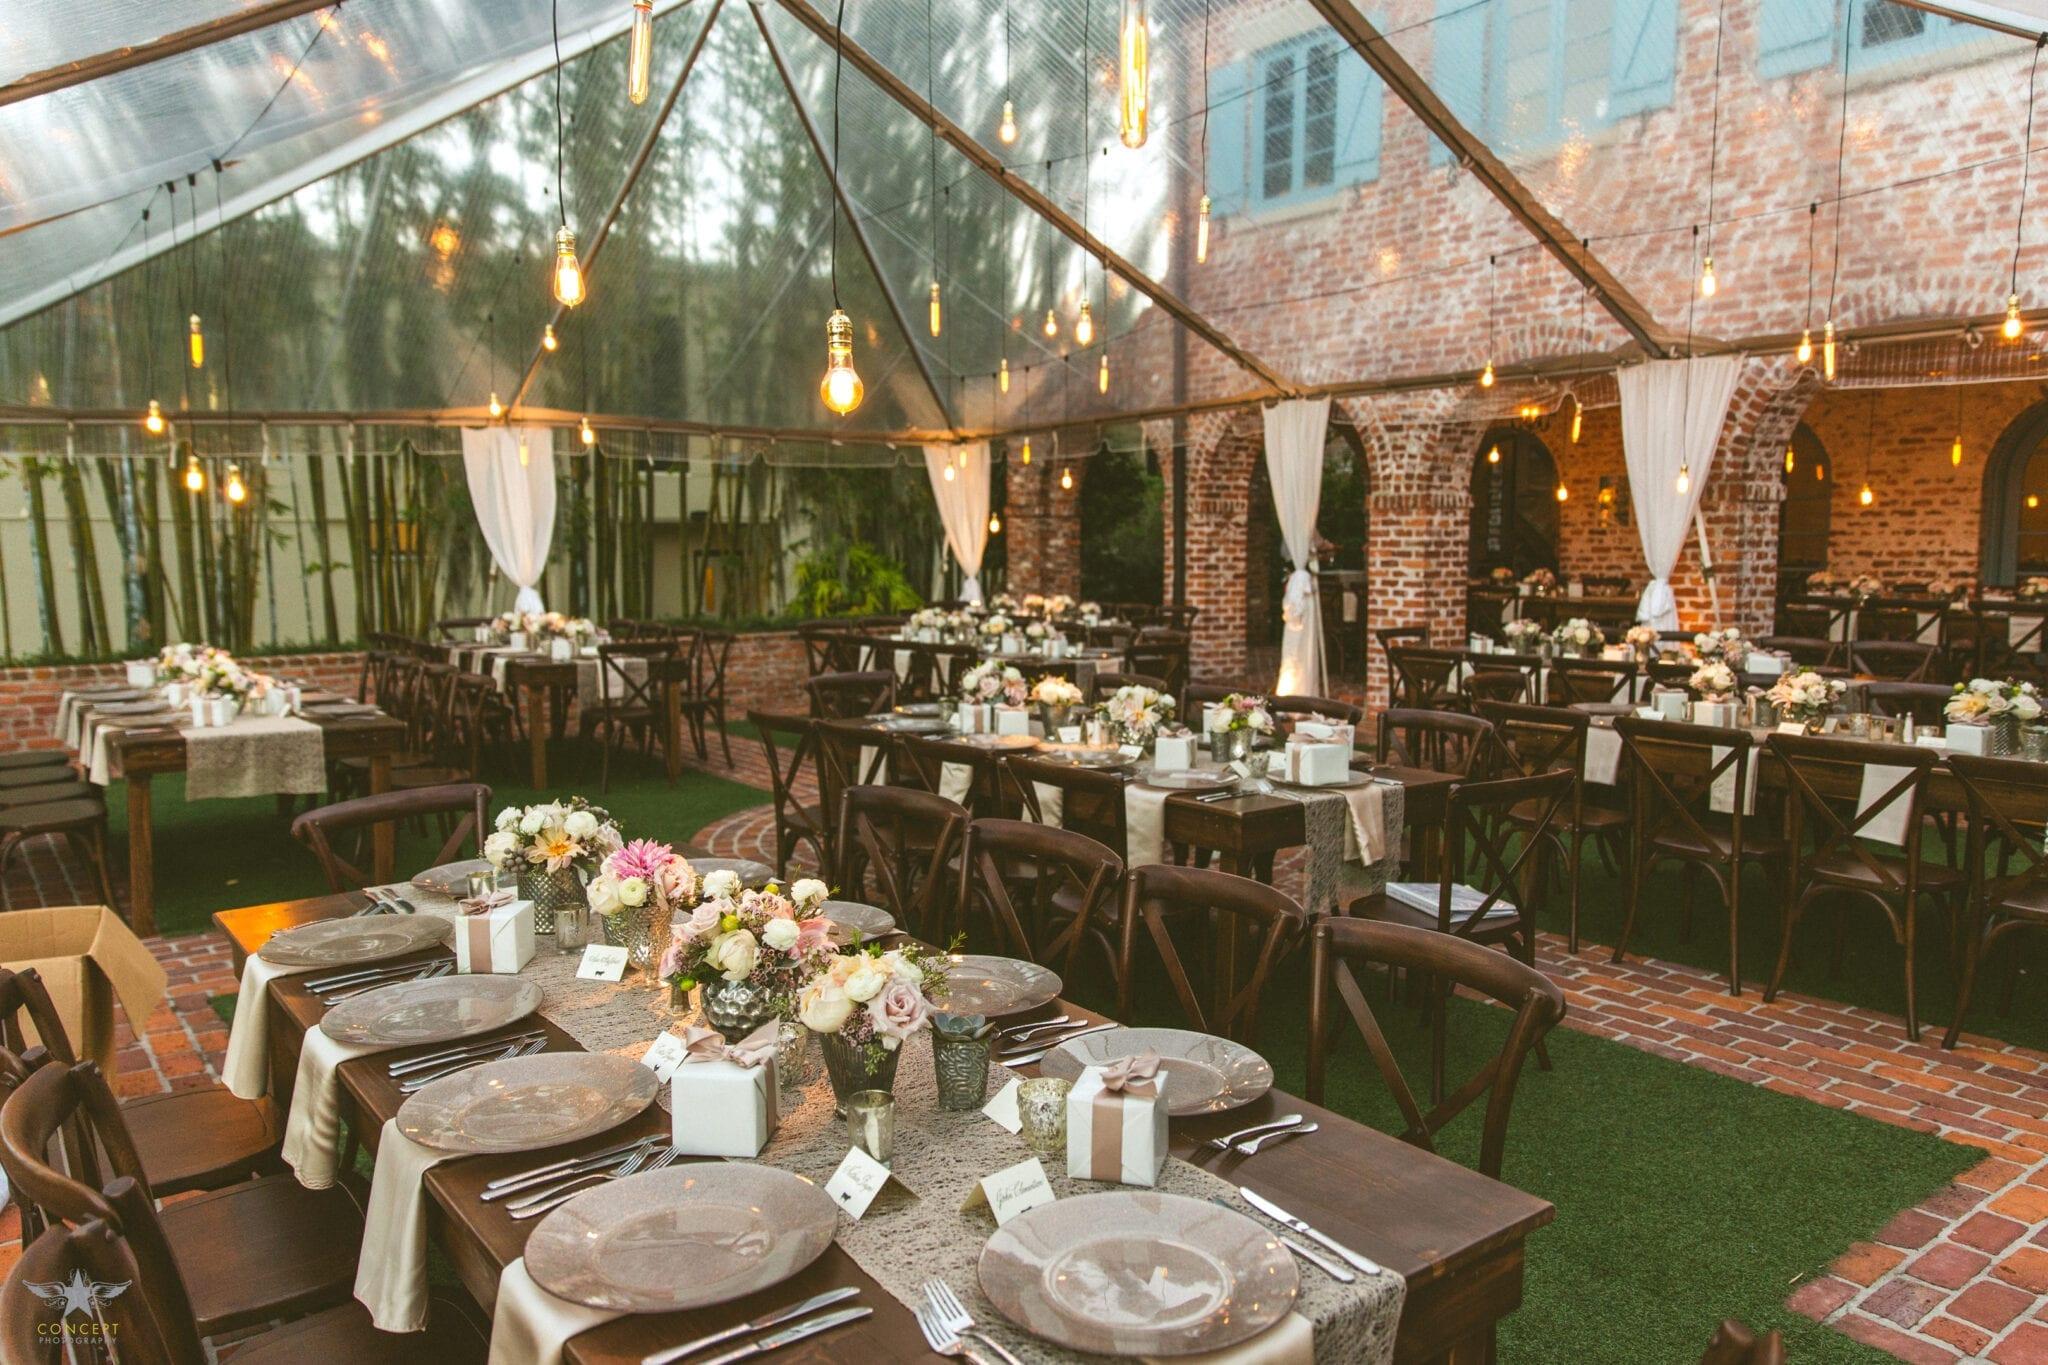 table chair rentals orlando replacement high covers jenni 43 jason gorgeous winter park wedding at casa feliz